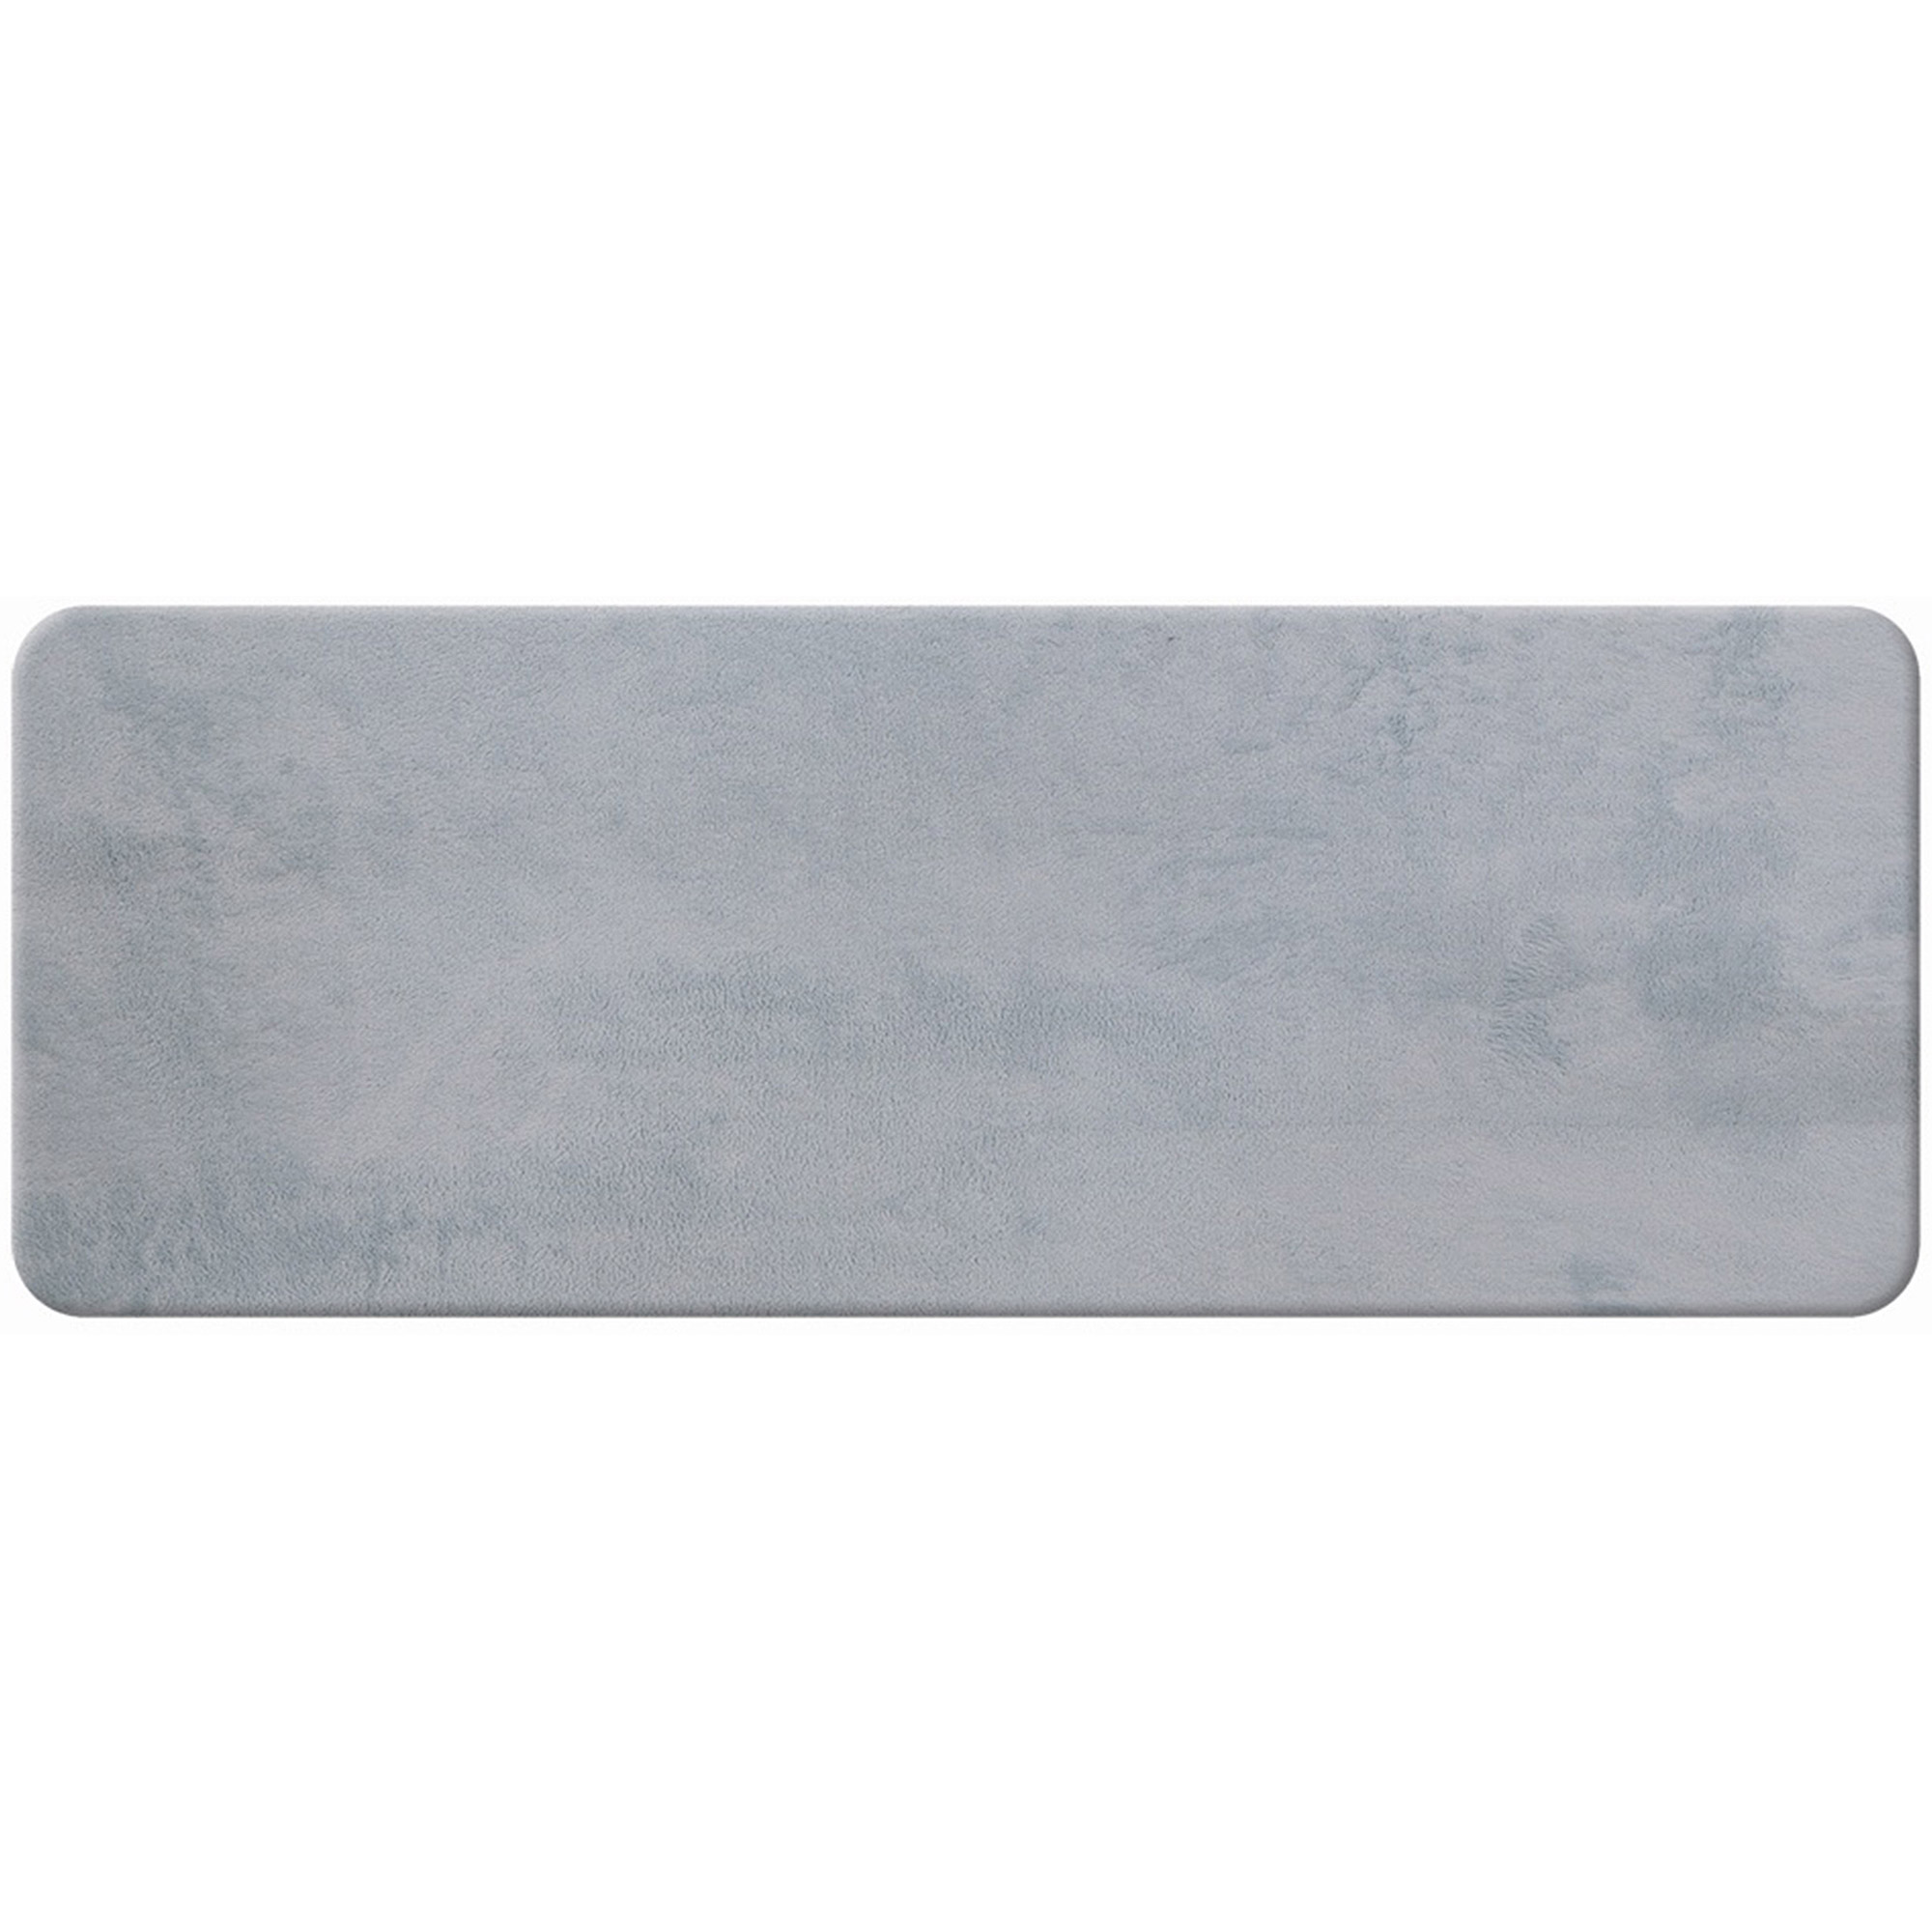 comfort co. sleep innovations the mat memory foam bath runner